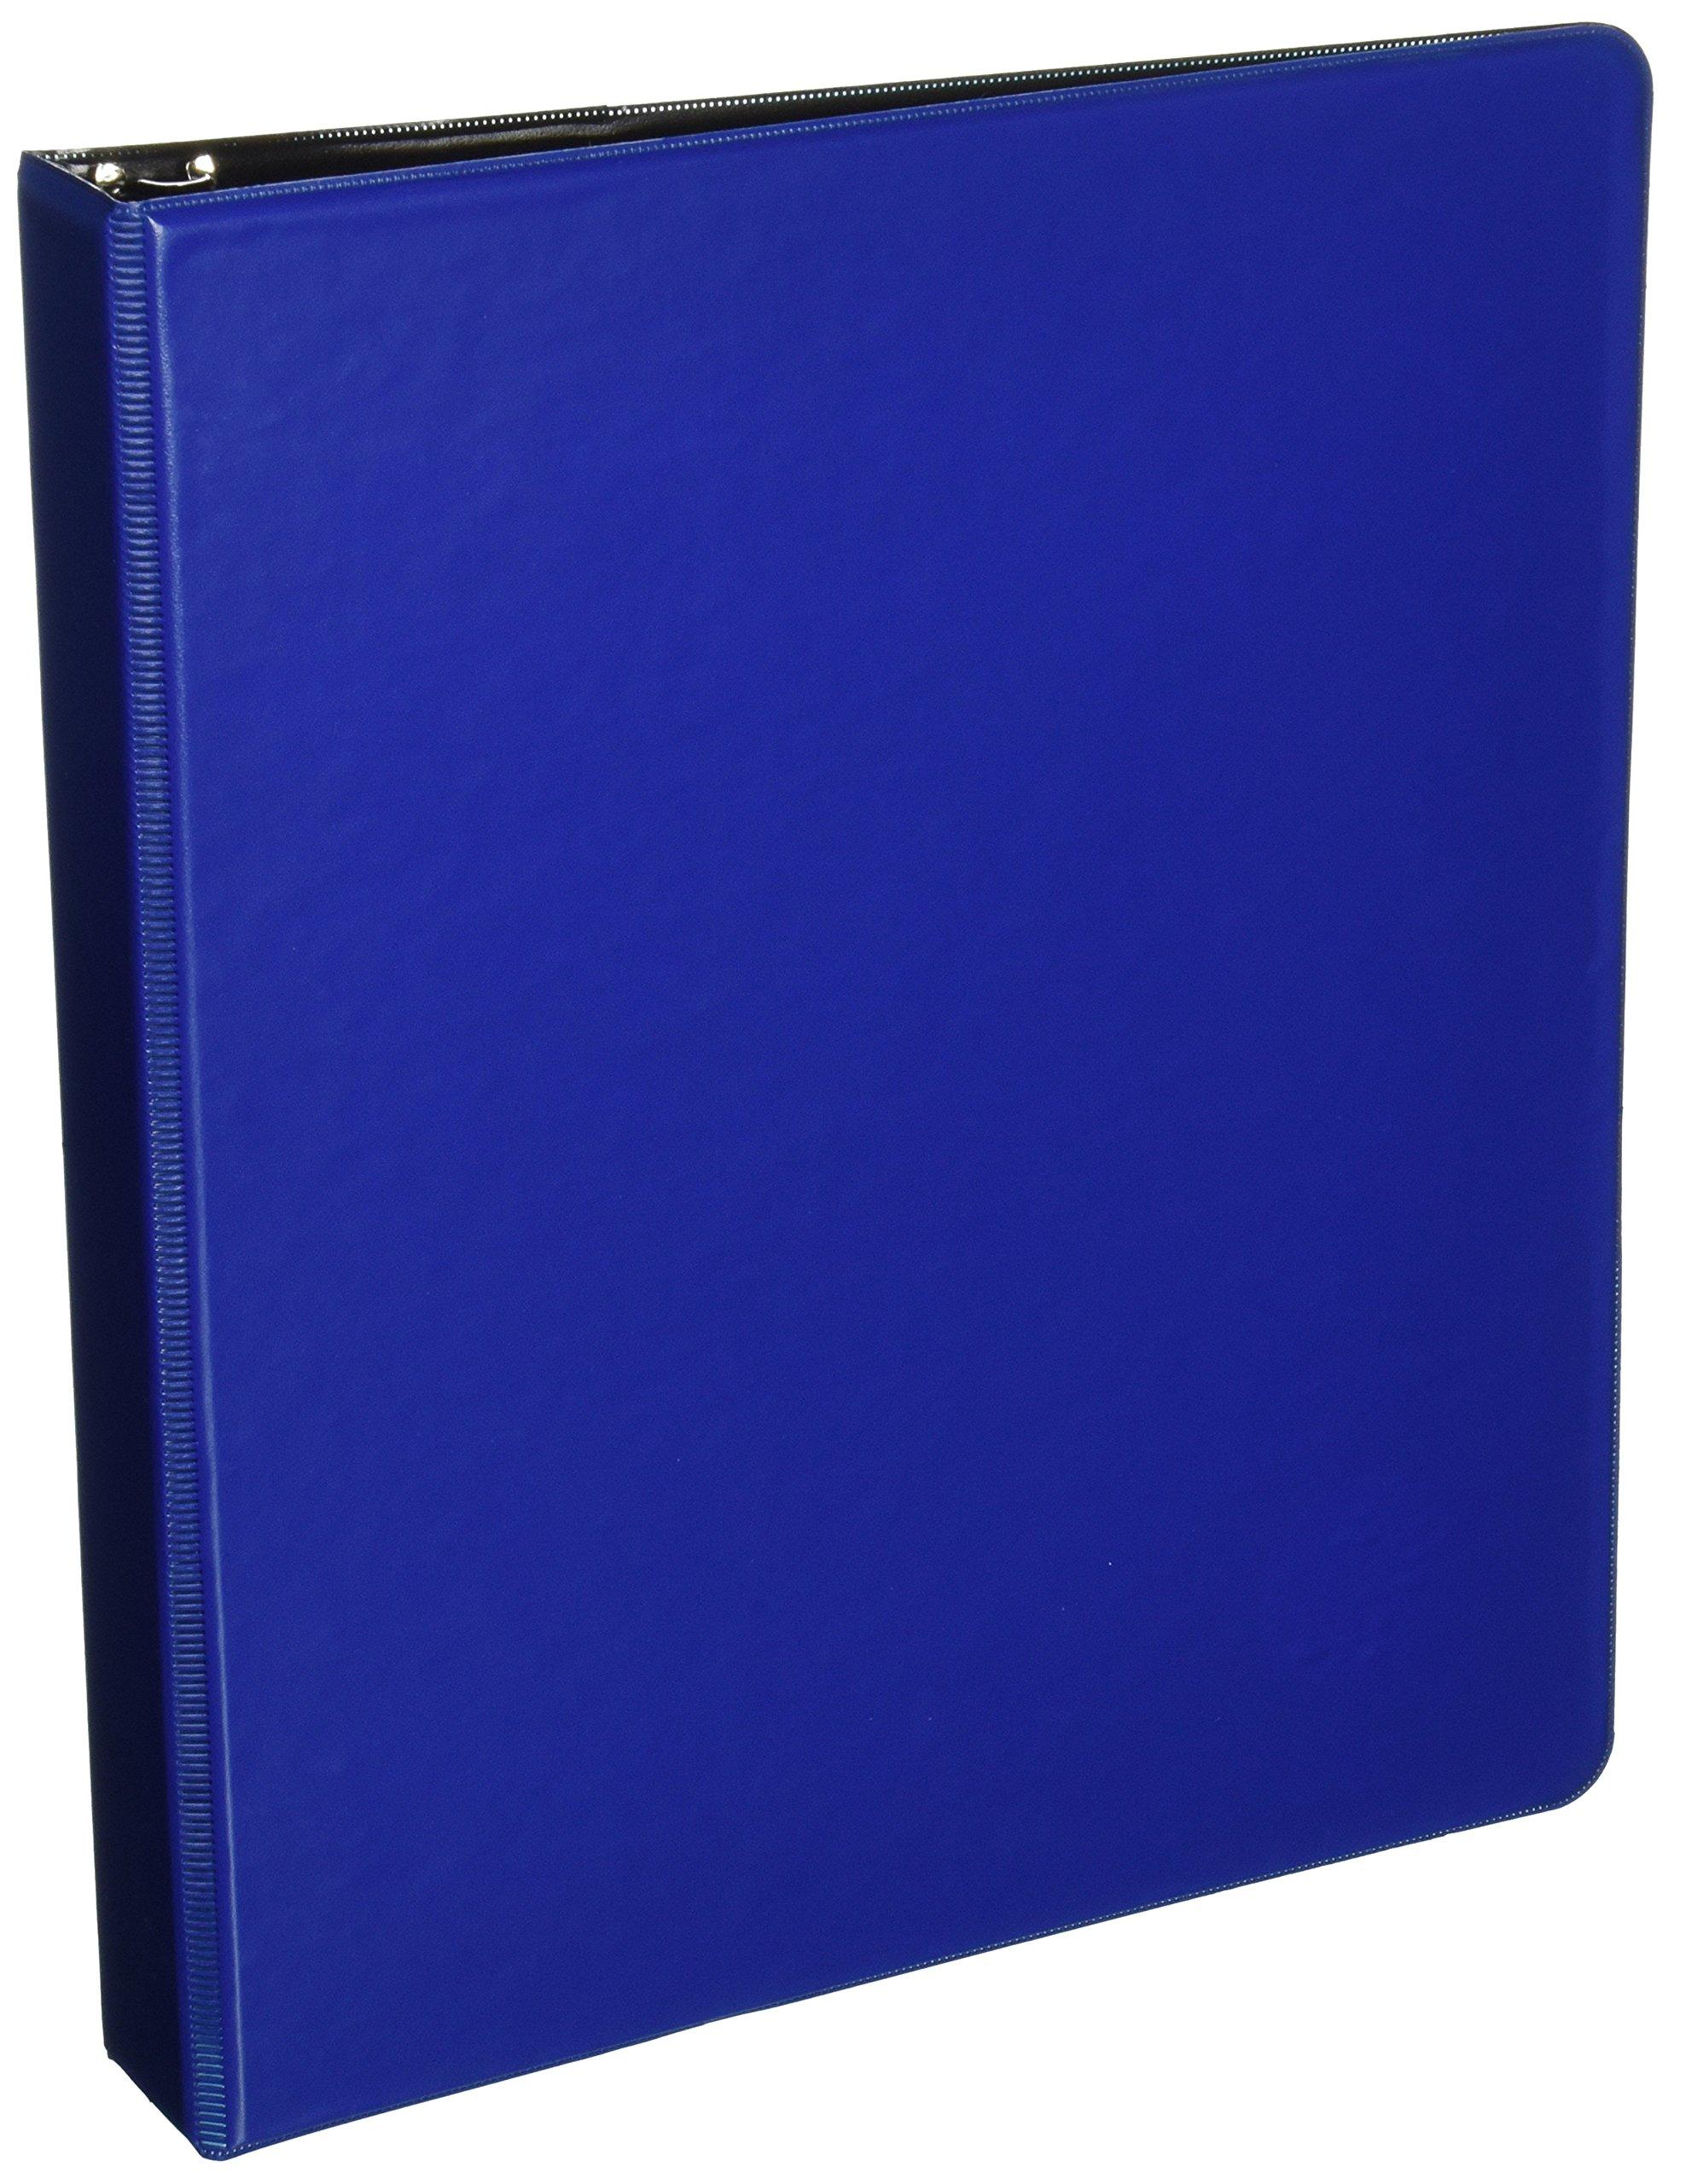 Wilson Jones 3 Ring Binder, 1 Inch Round Ring, 4 Pack, Blue (W70368-14NBLPP)